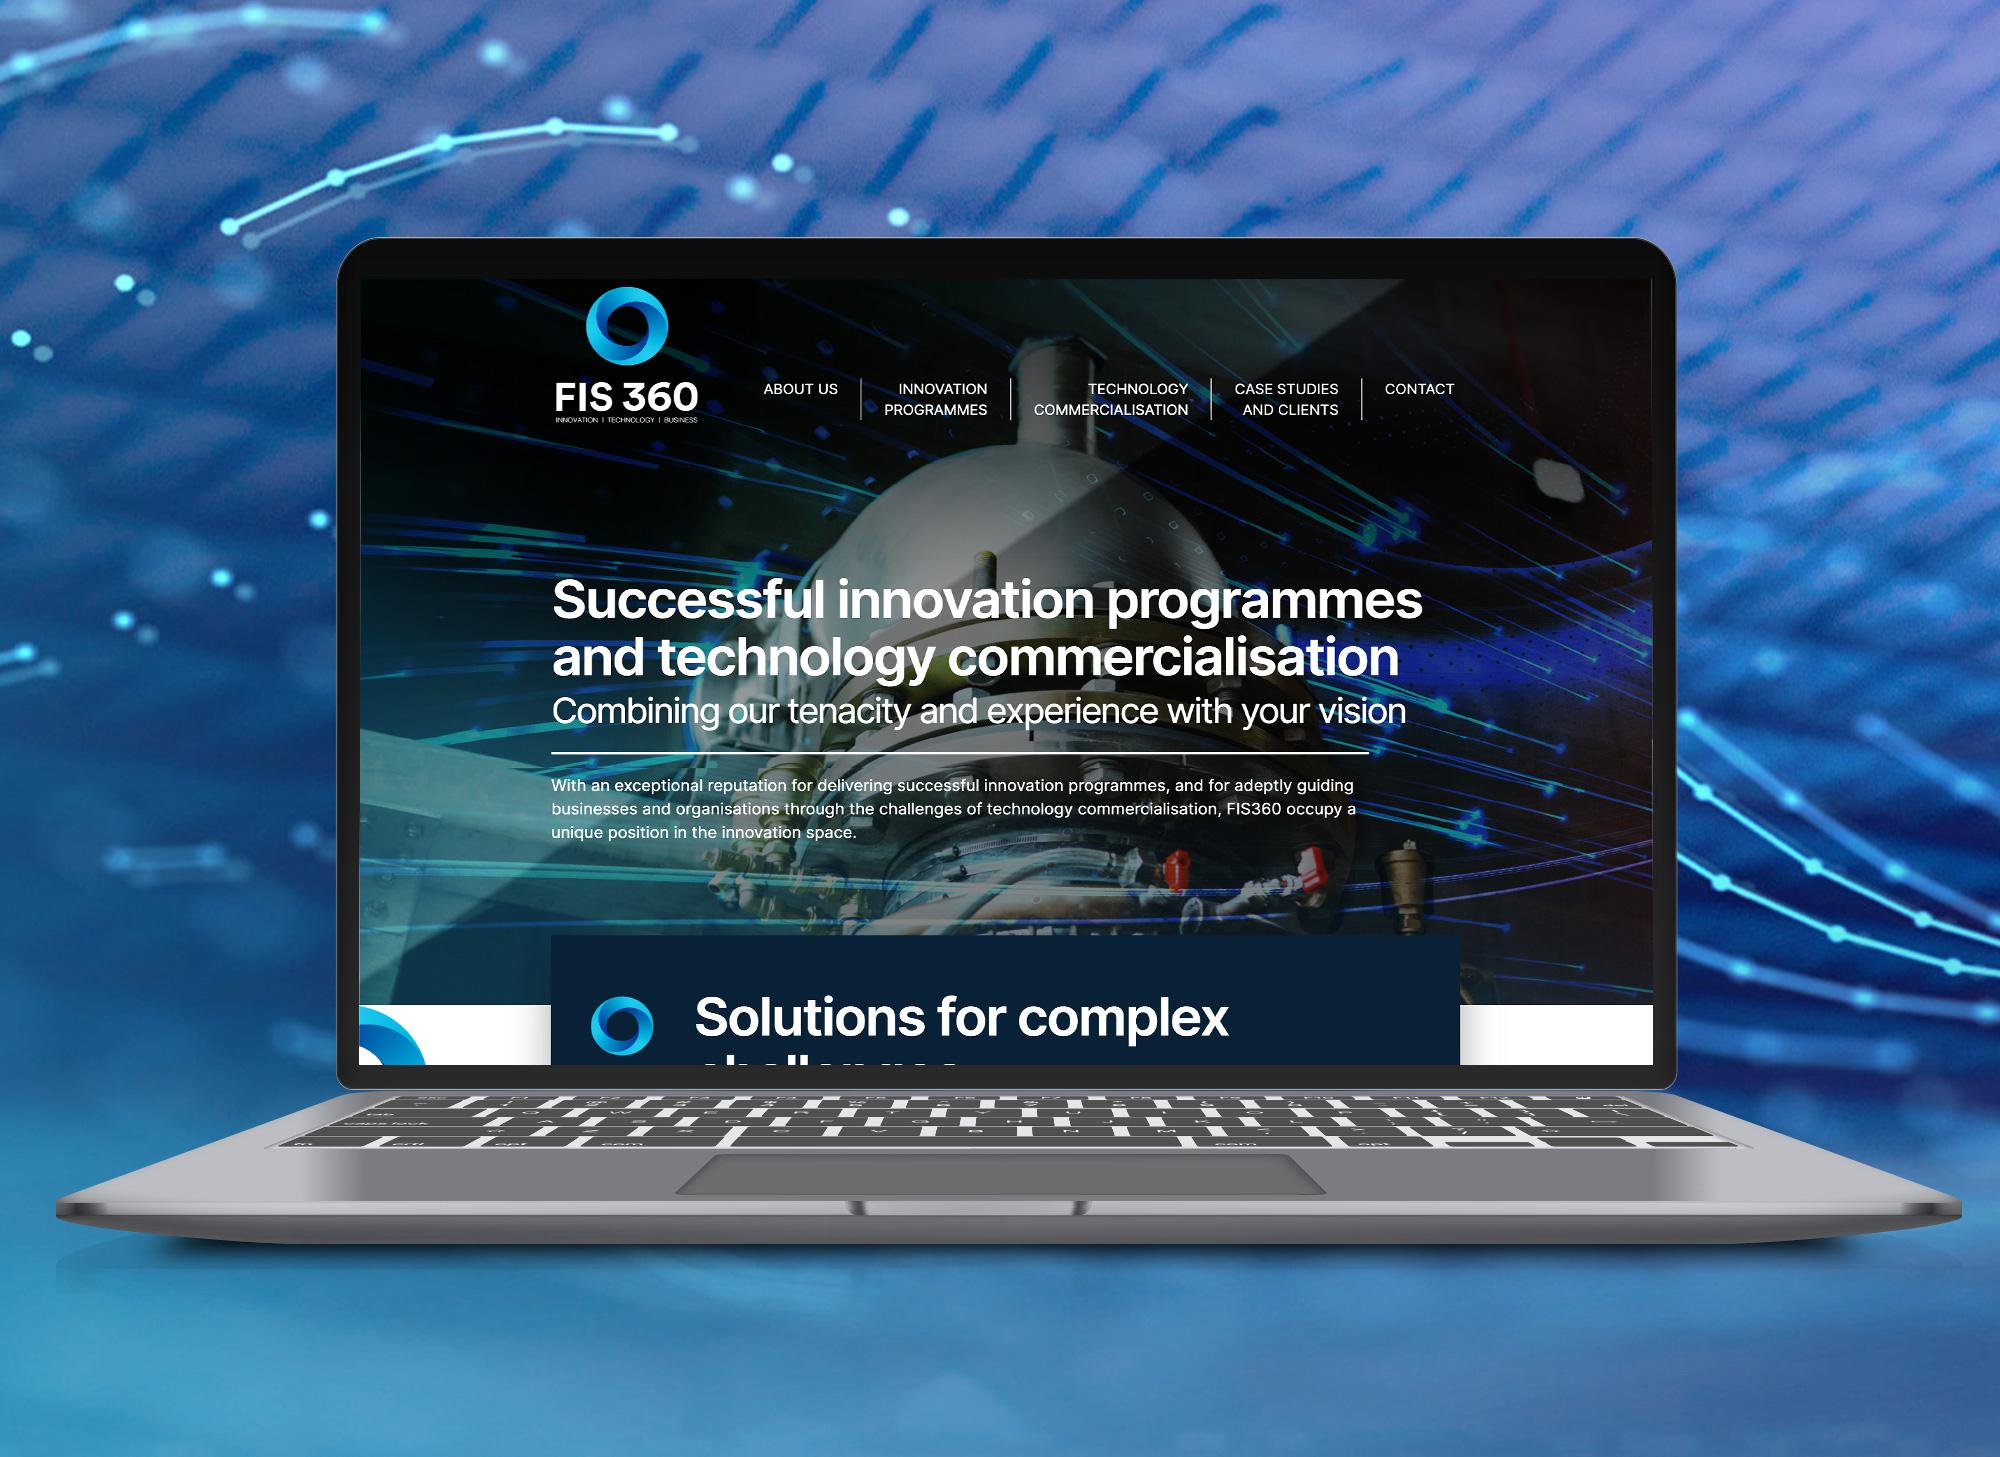 FIS360 web design and re brand